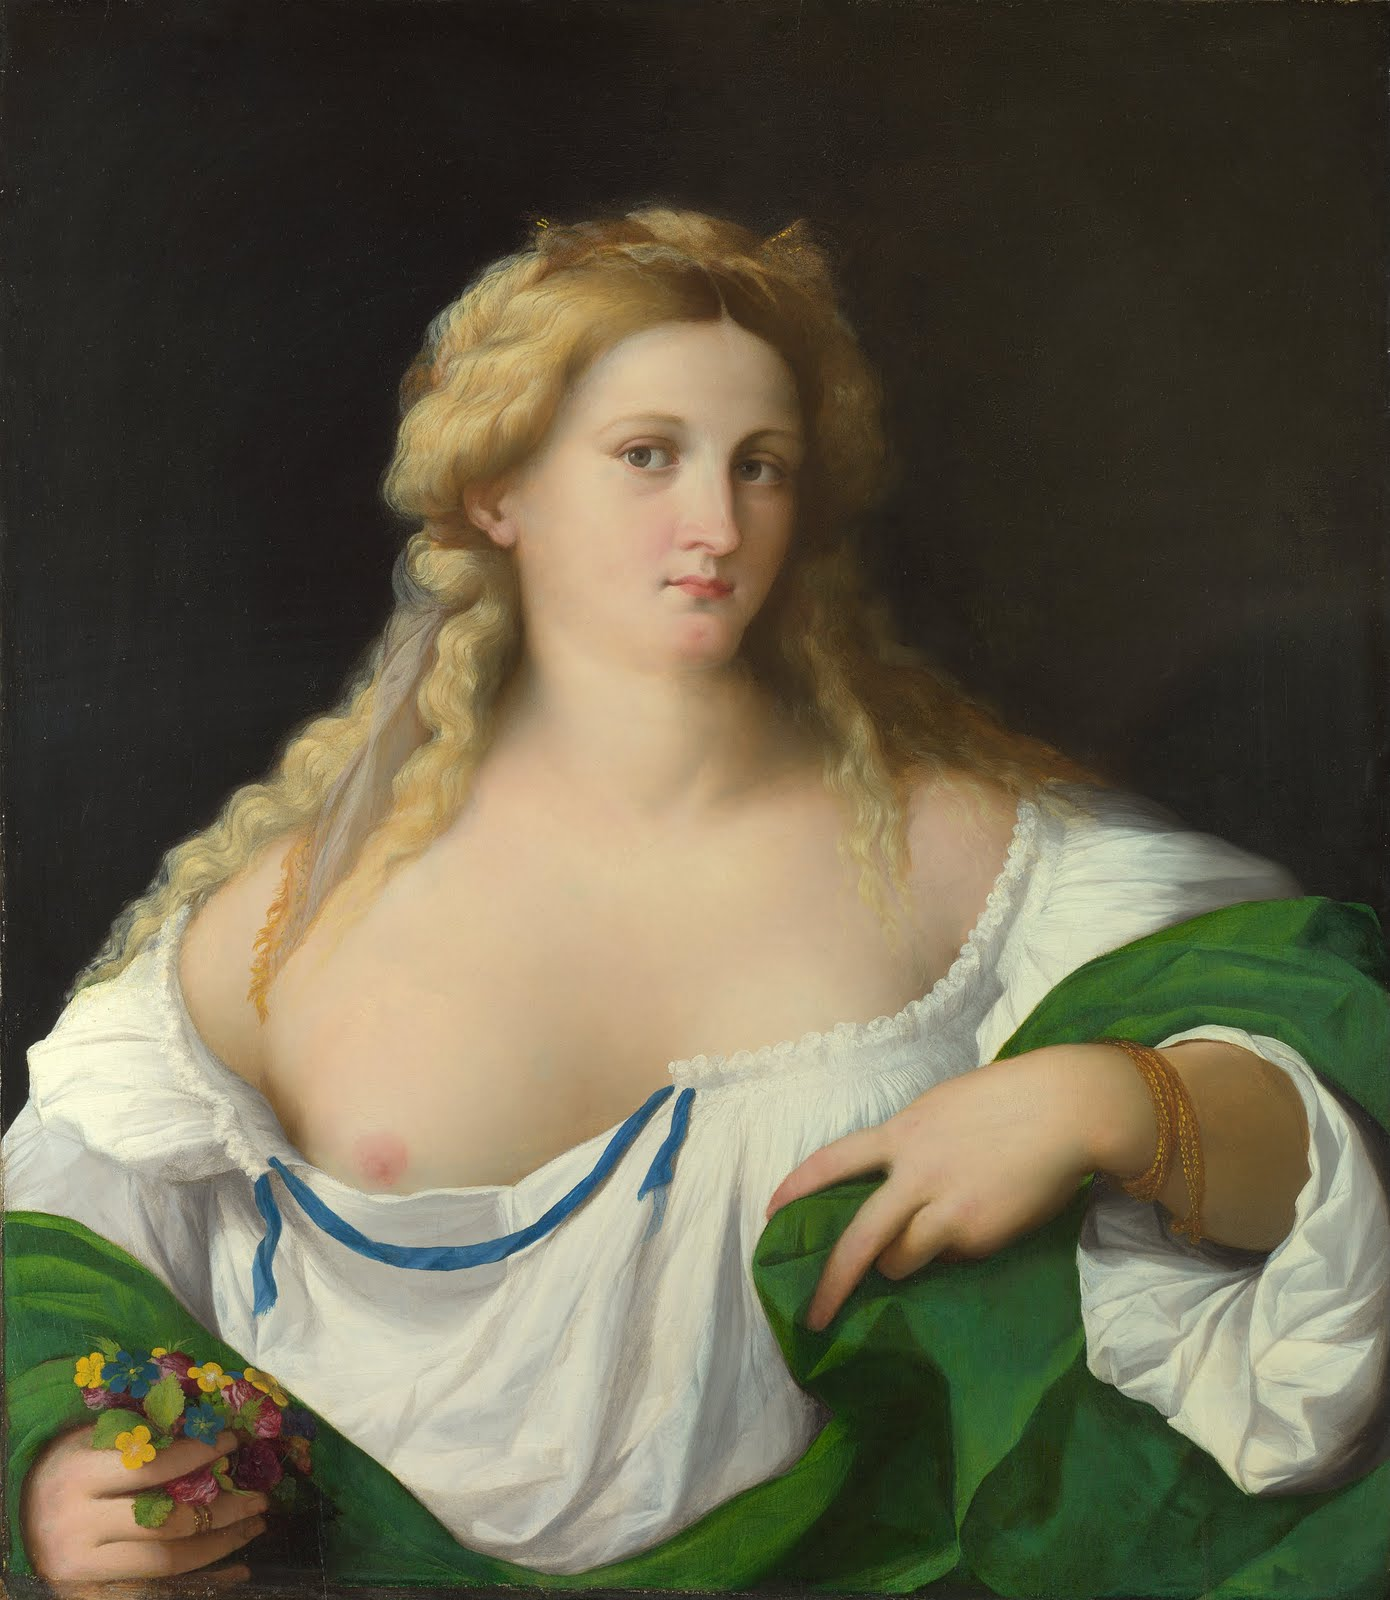 http://4.bp.blogspot.com/-nbO14uQjiP0/TyG4QAA4b0I/AAAAAAAAEf0/9z2J-8e9jpA/s1600/%25281520%2529%2BPalma_Vecchio_-_A_Blonde_Woman_-_Google_Art_Project.jpg